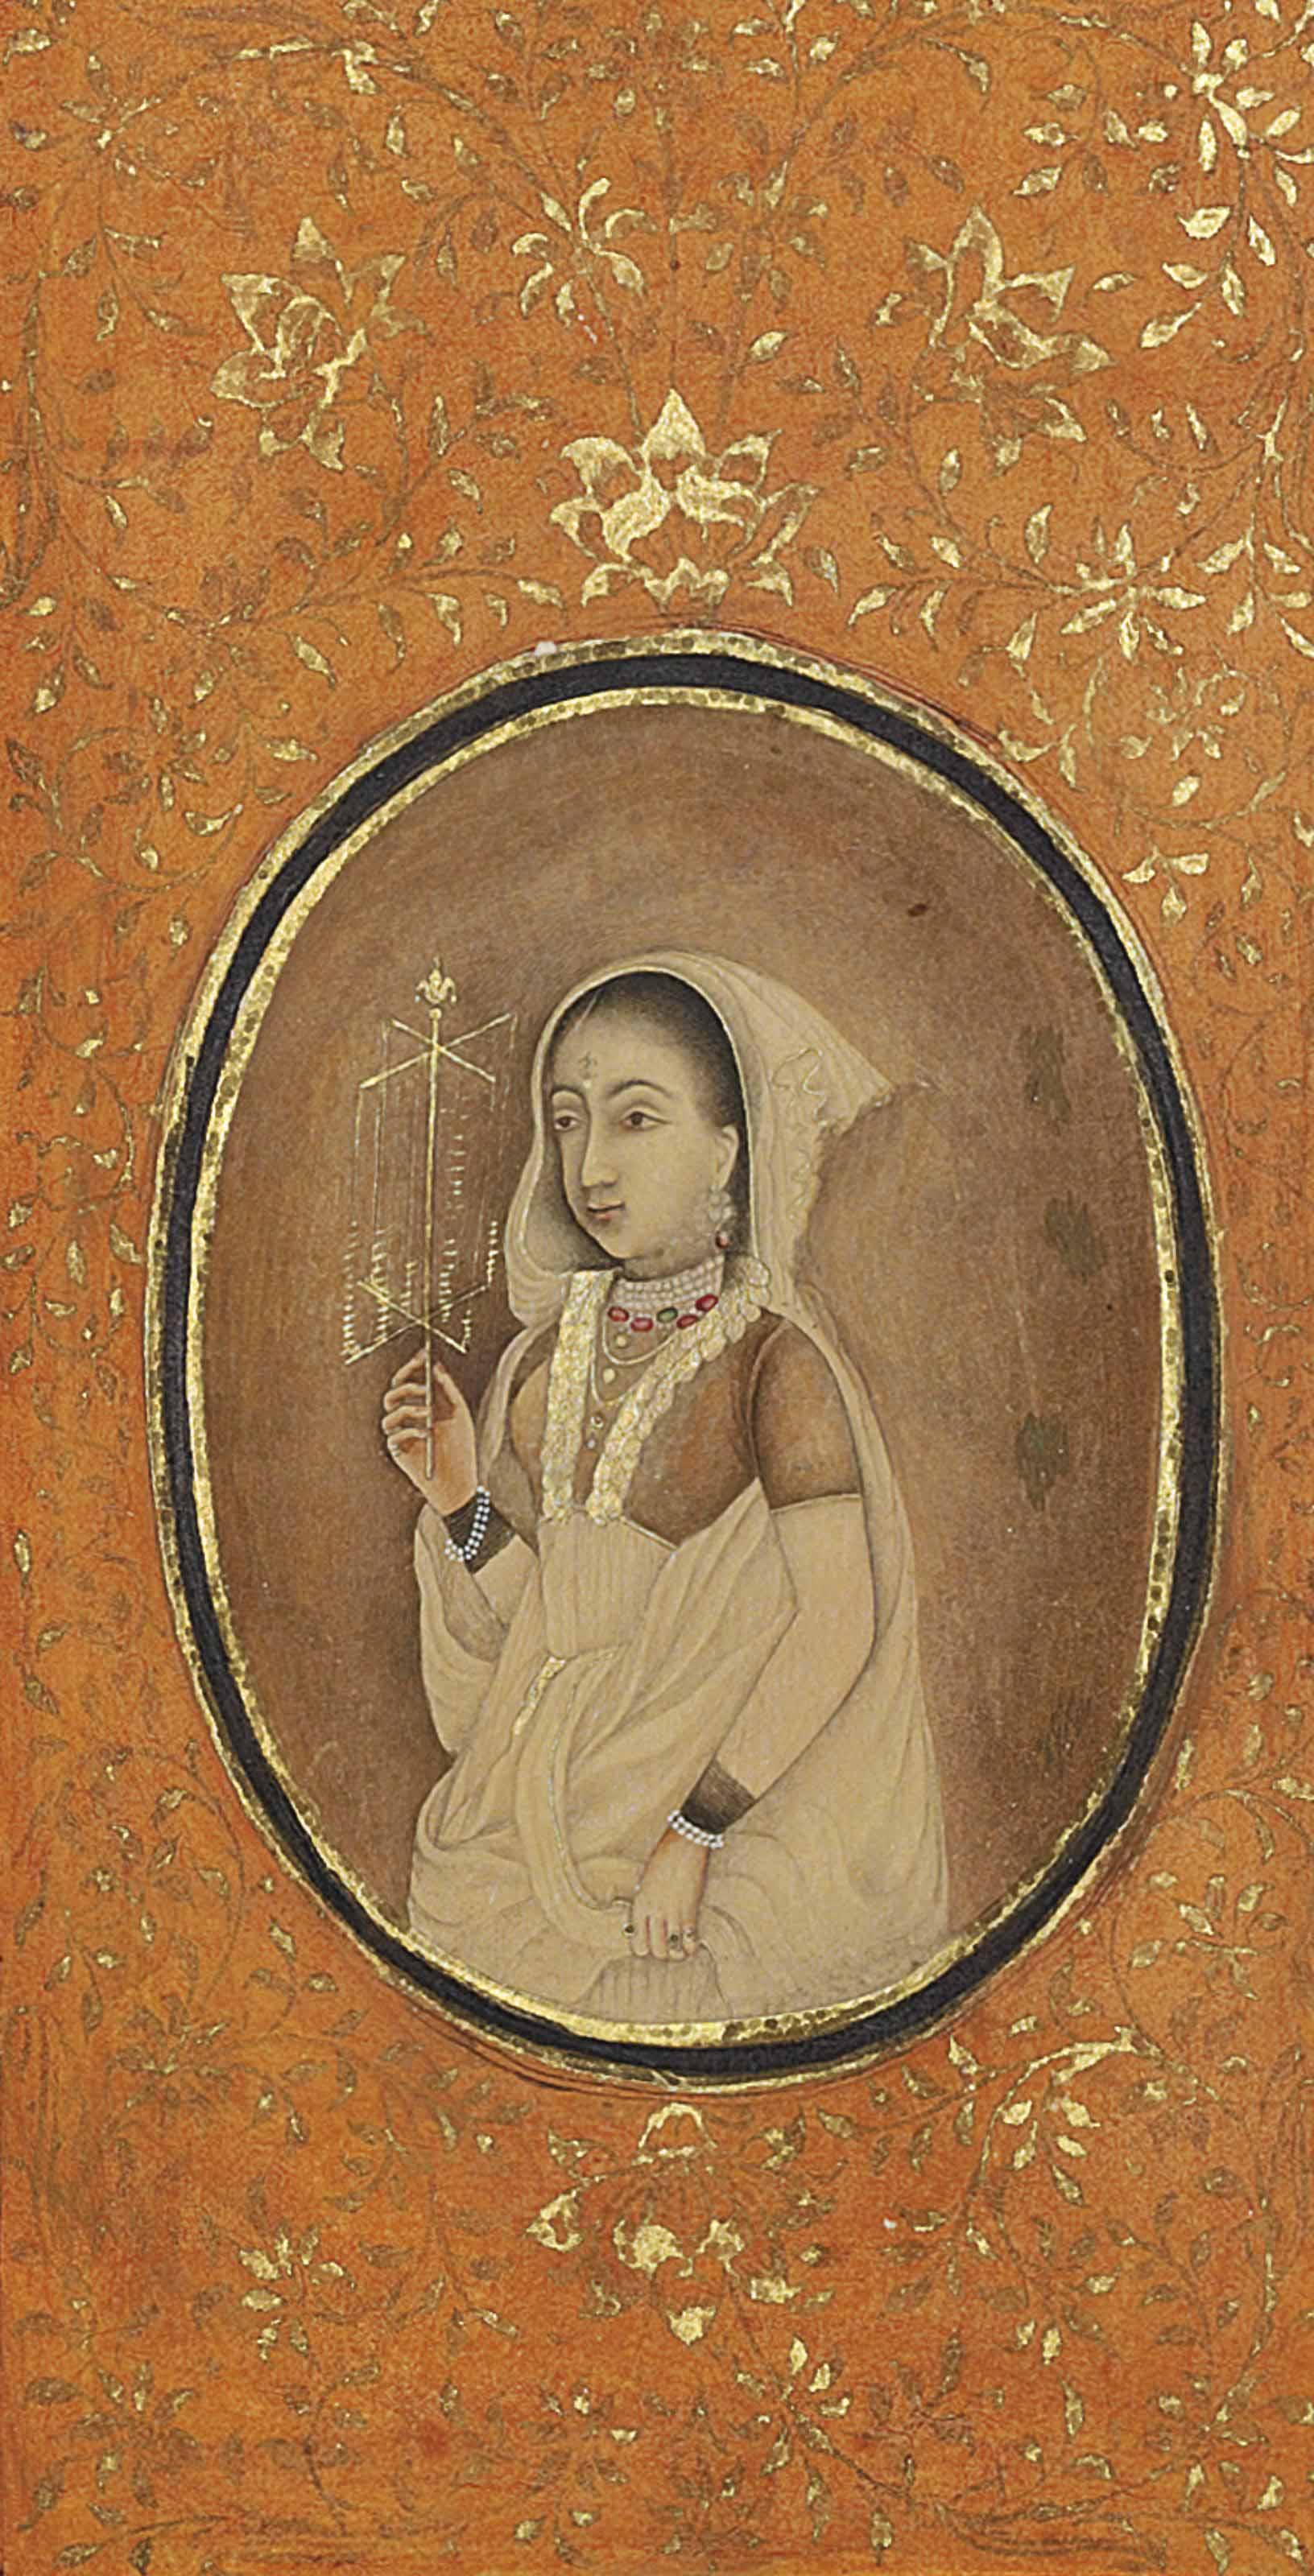 A HINDU LADY IN EUROPEAN-INSPIRED DRESS